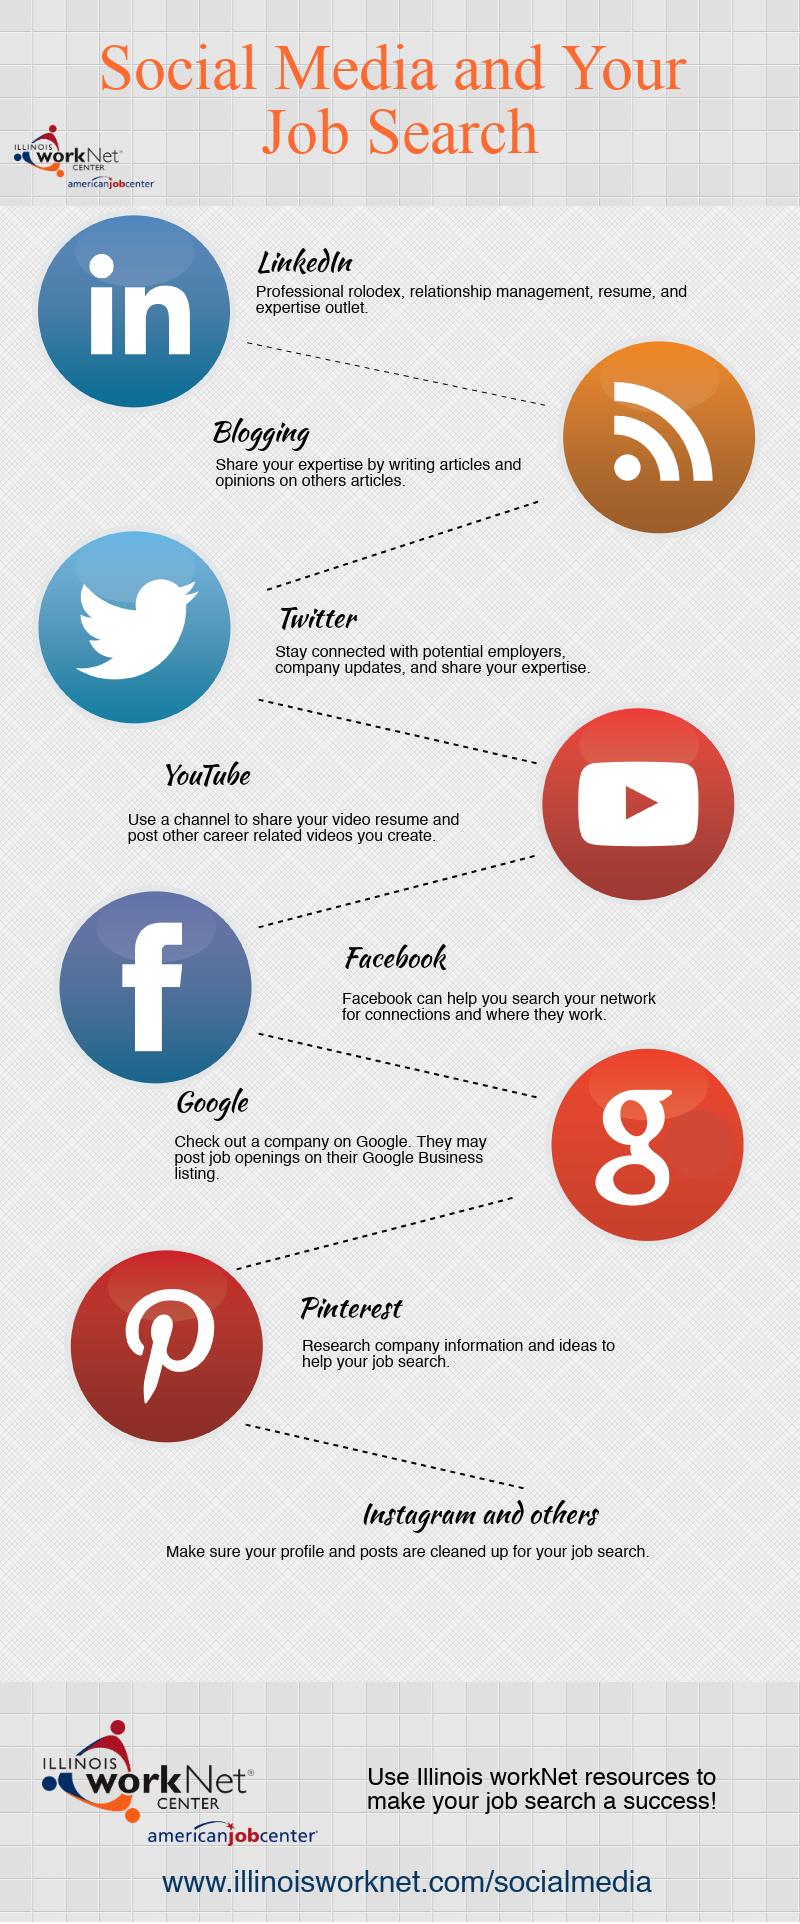 Social Media and Job Search